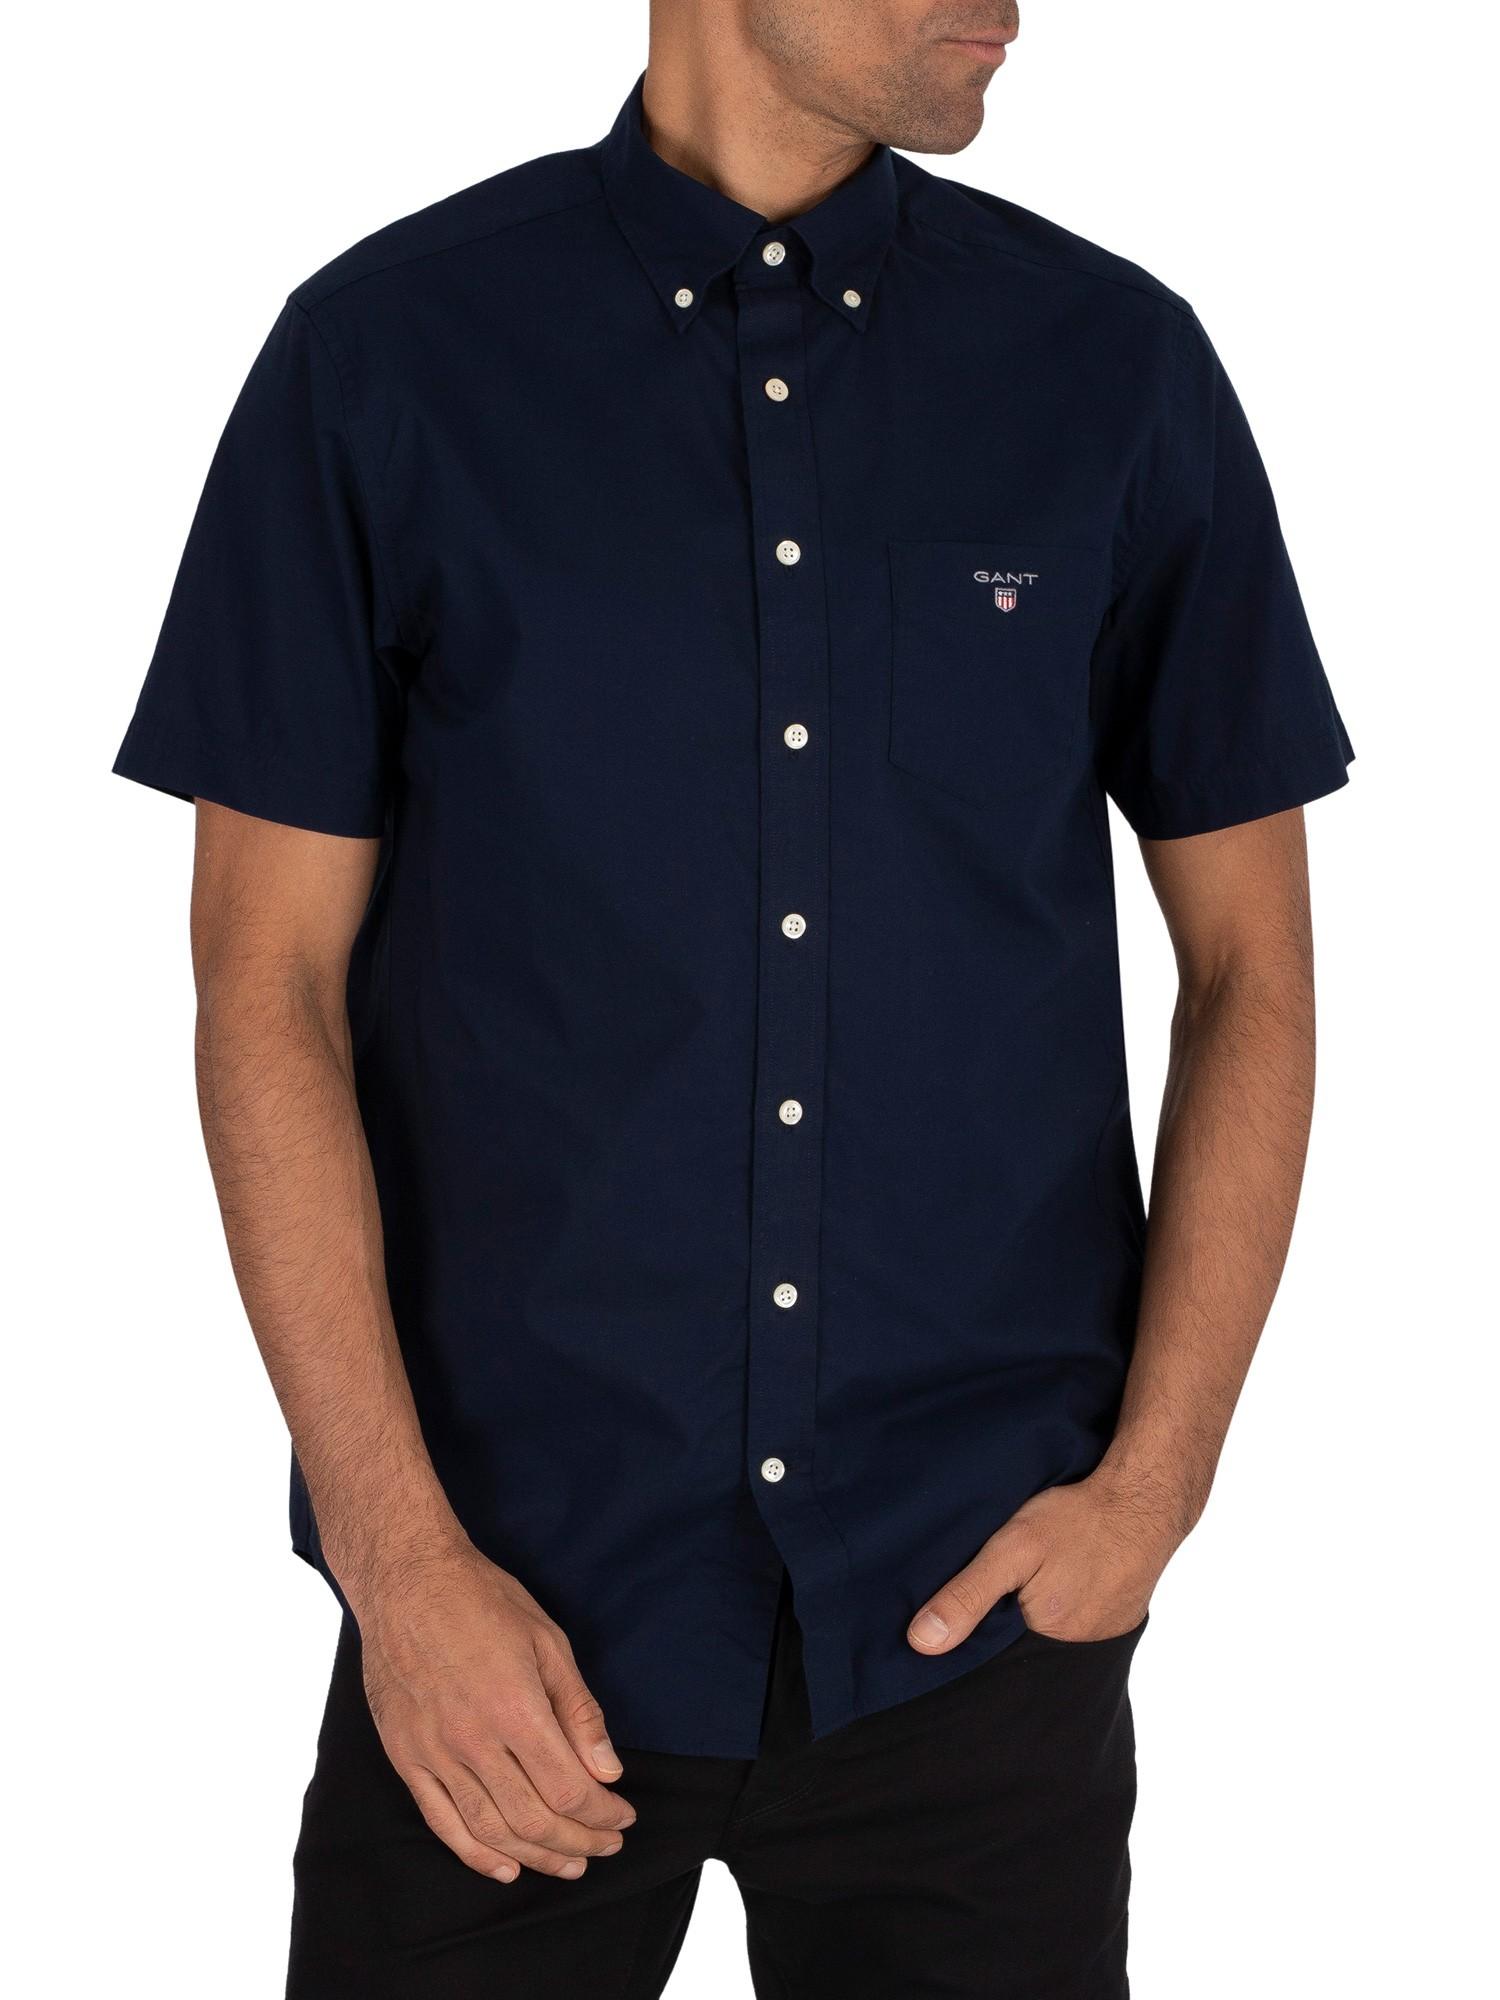 Broadcloth Short Sleeved Shirt